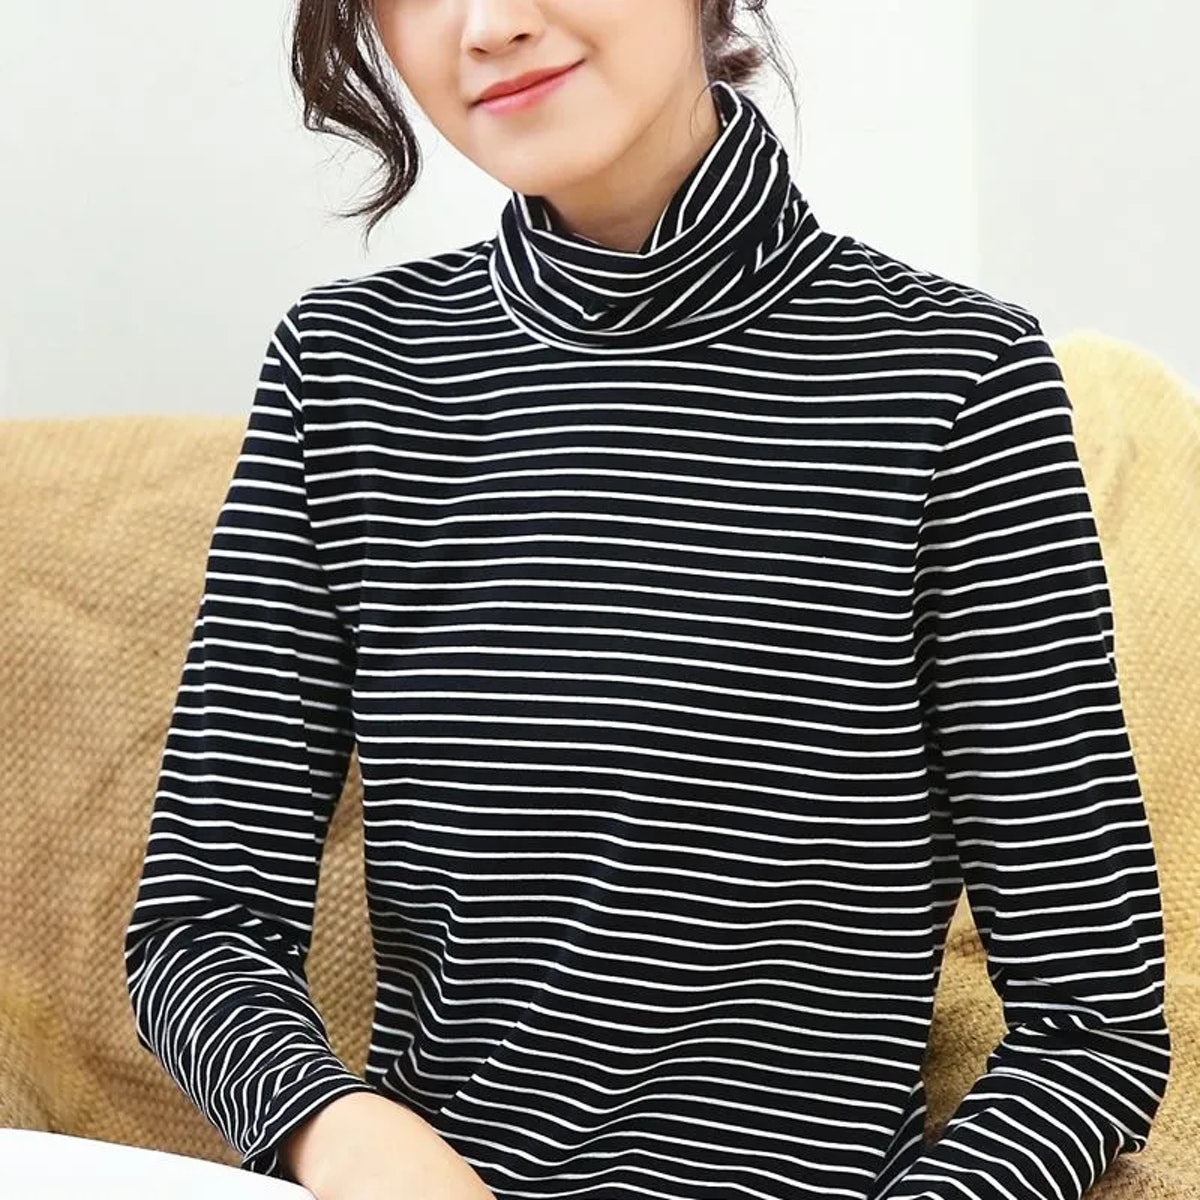 Mooreshow - Striped Turtleneck Long-Sleeve T-Shirt